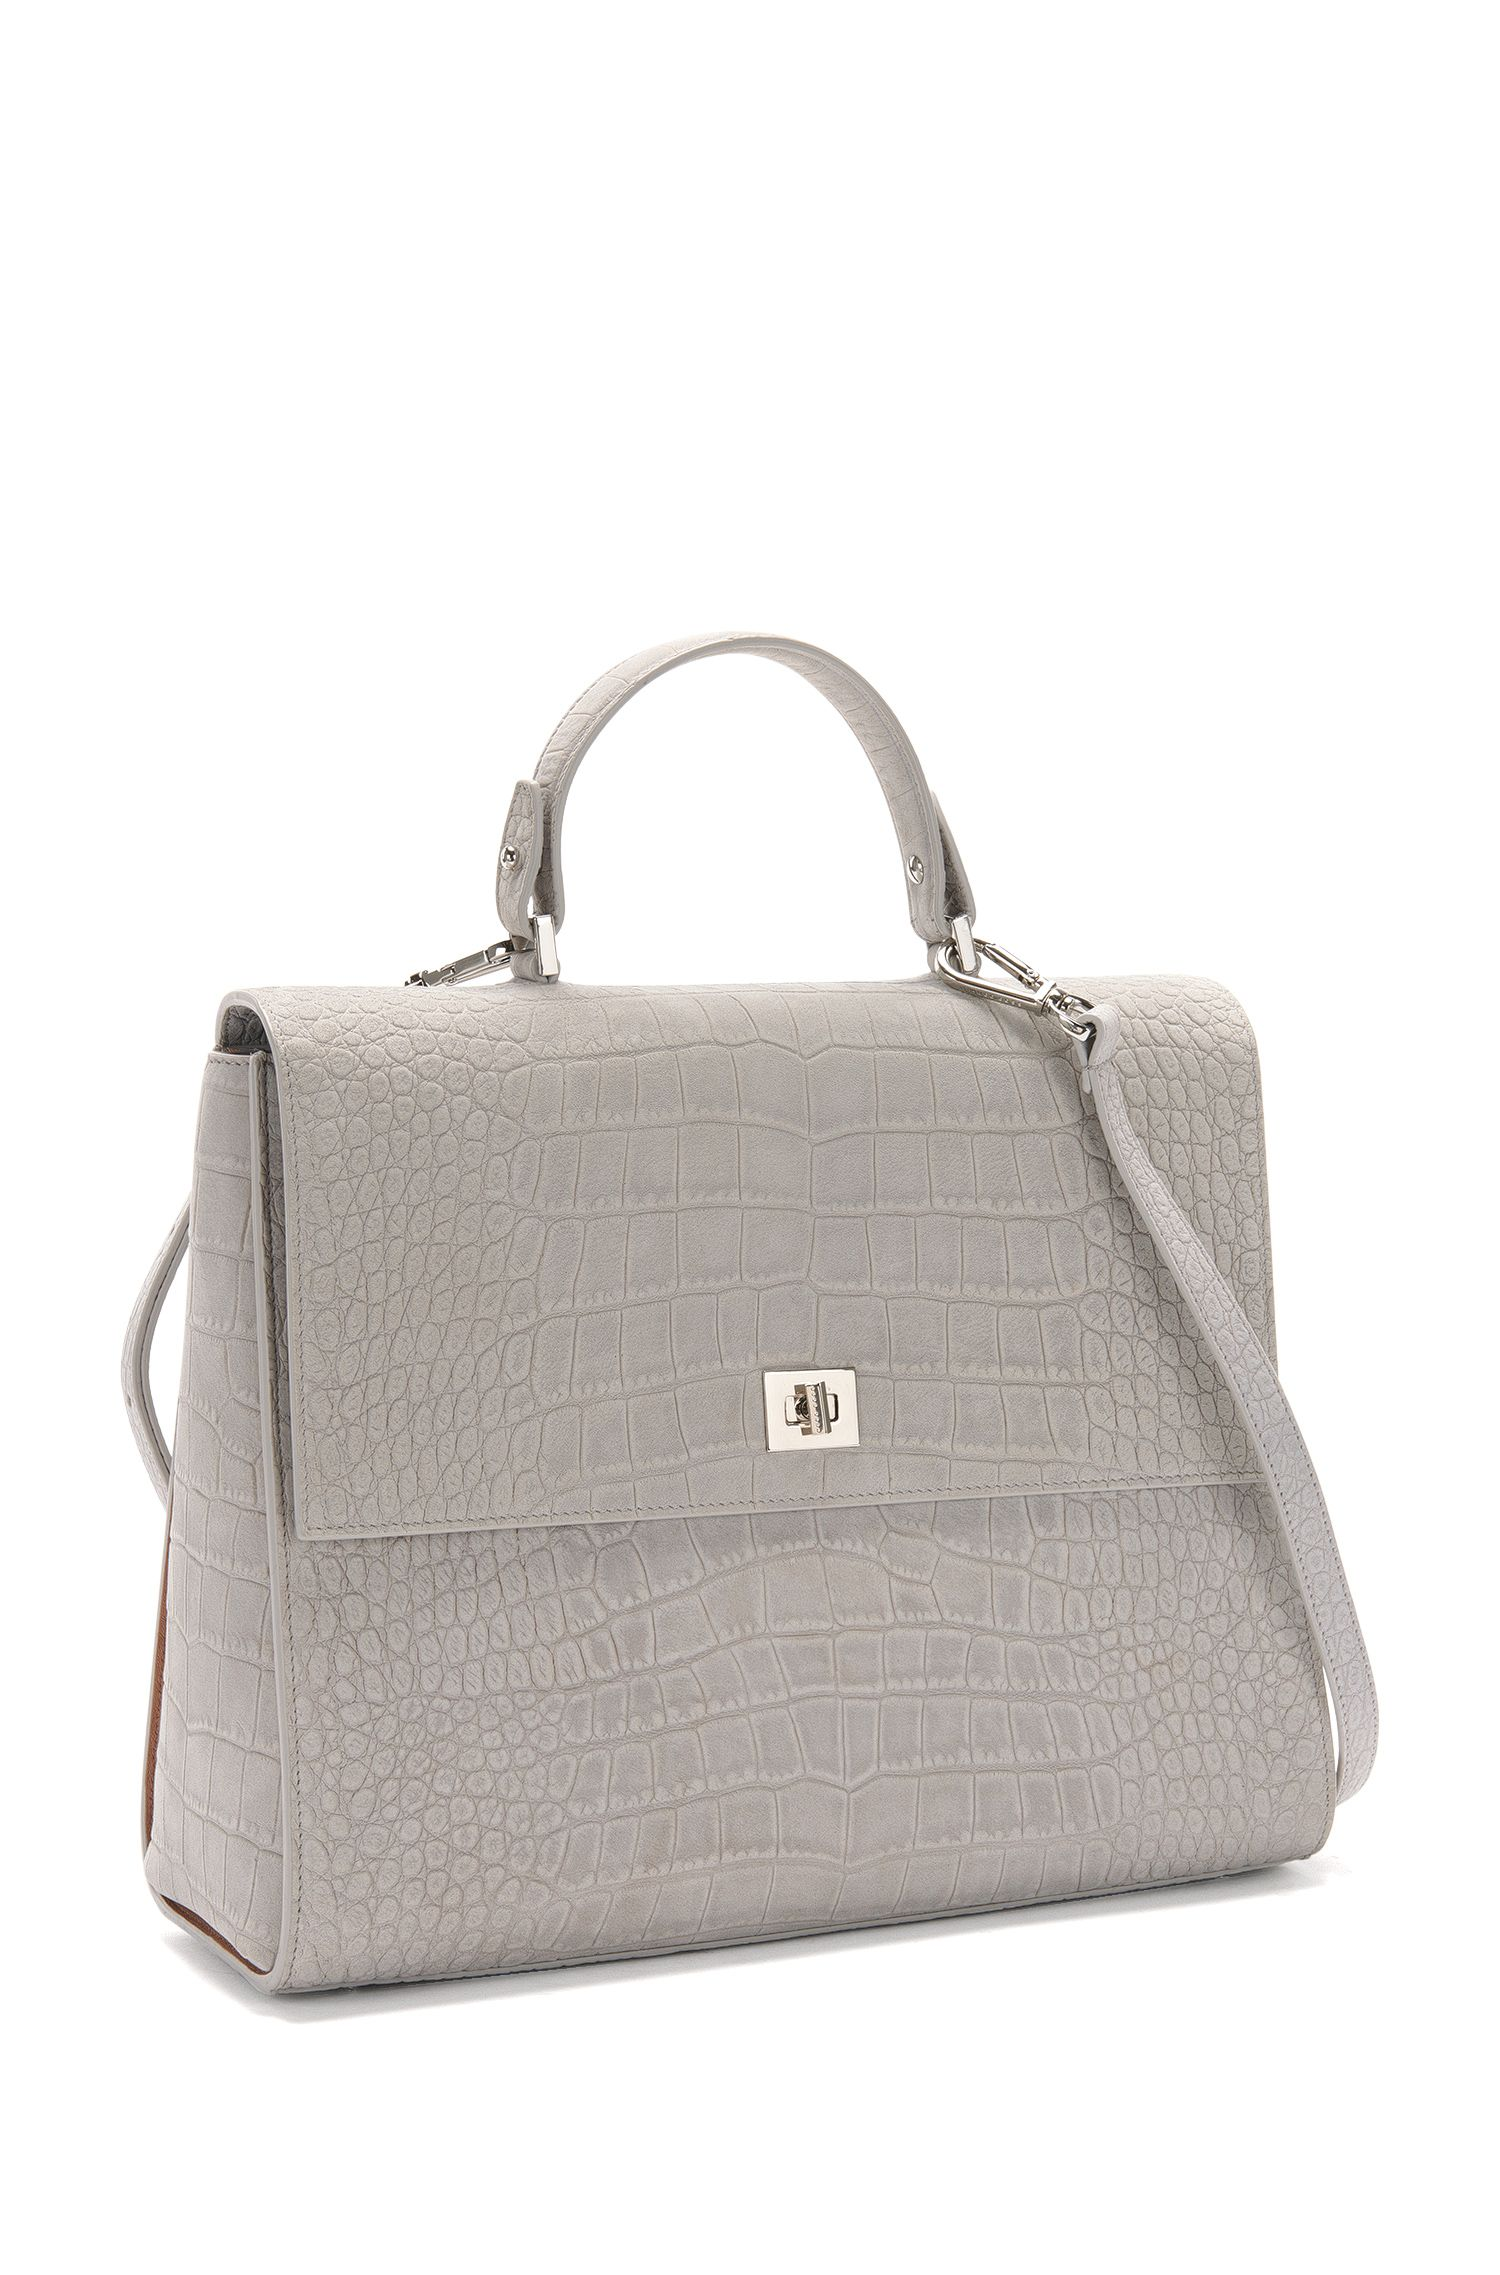 BOSS Bespoke Handtasche aus Nubukleder